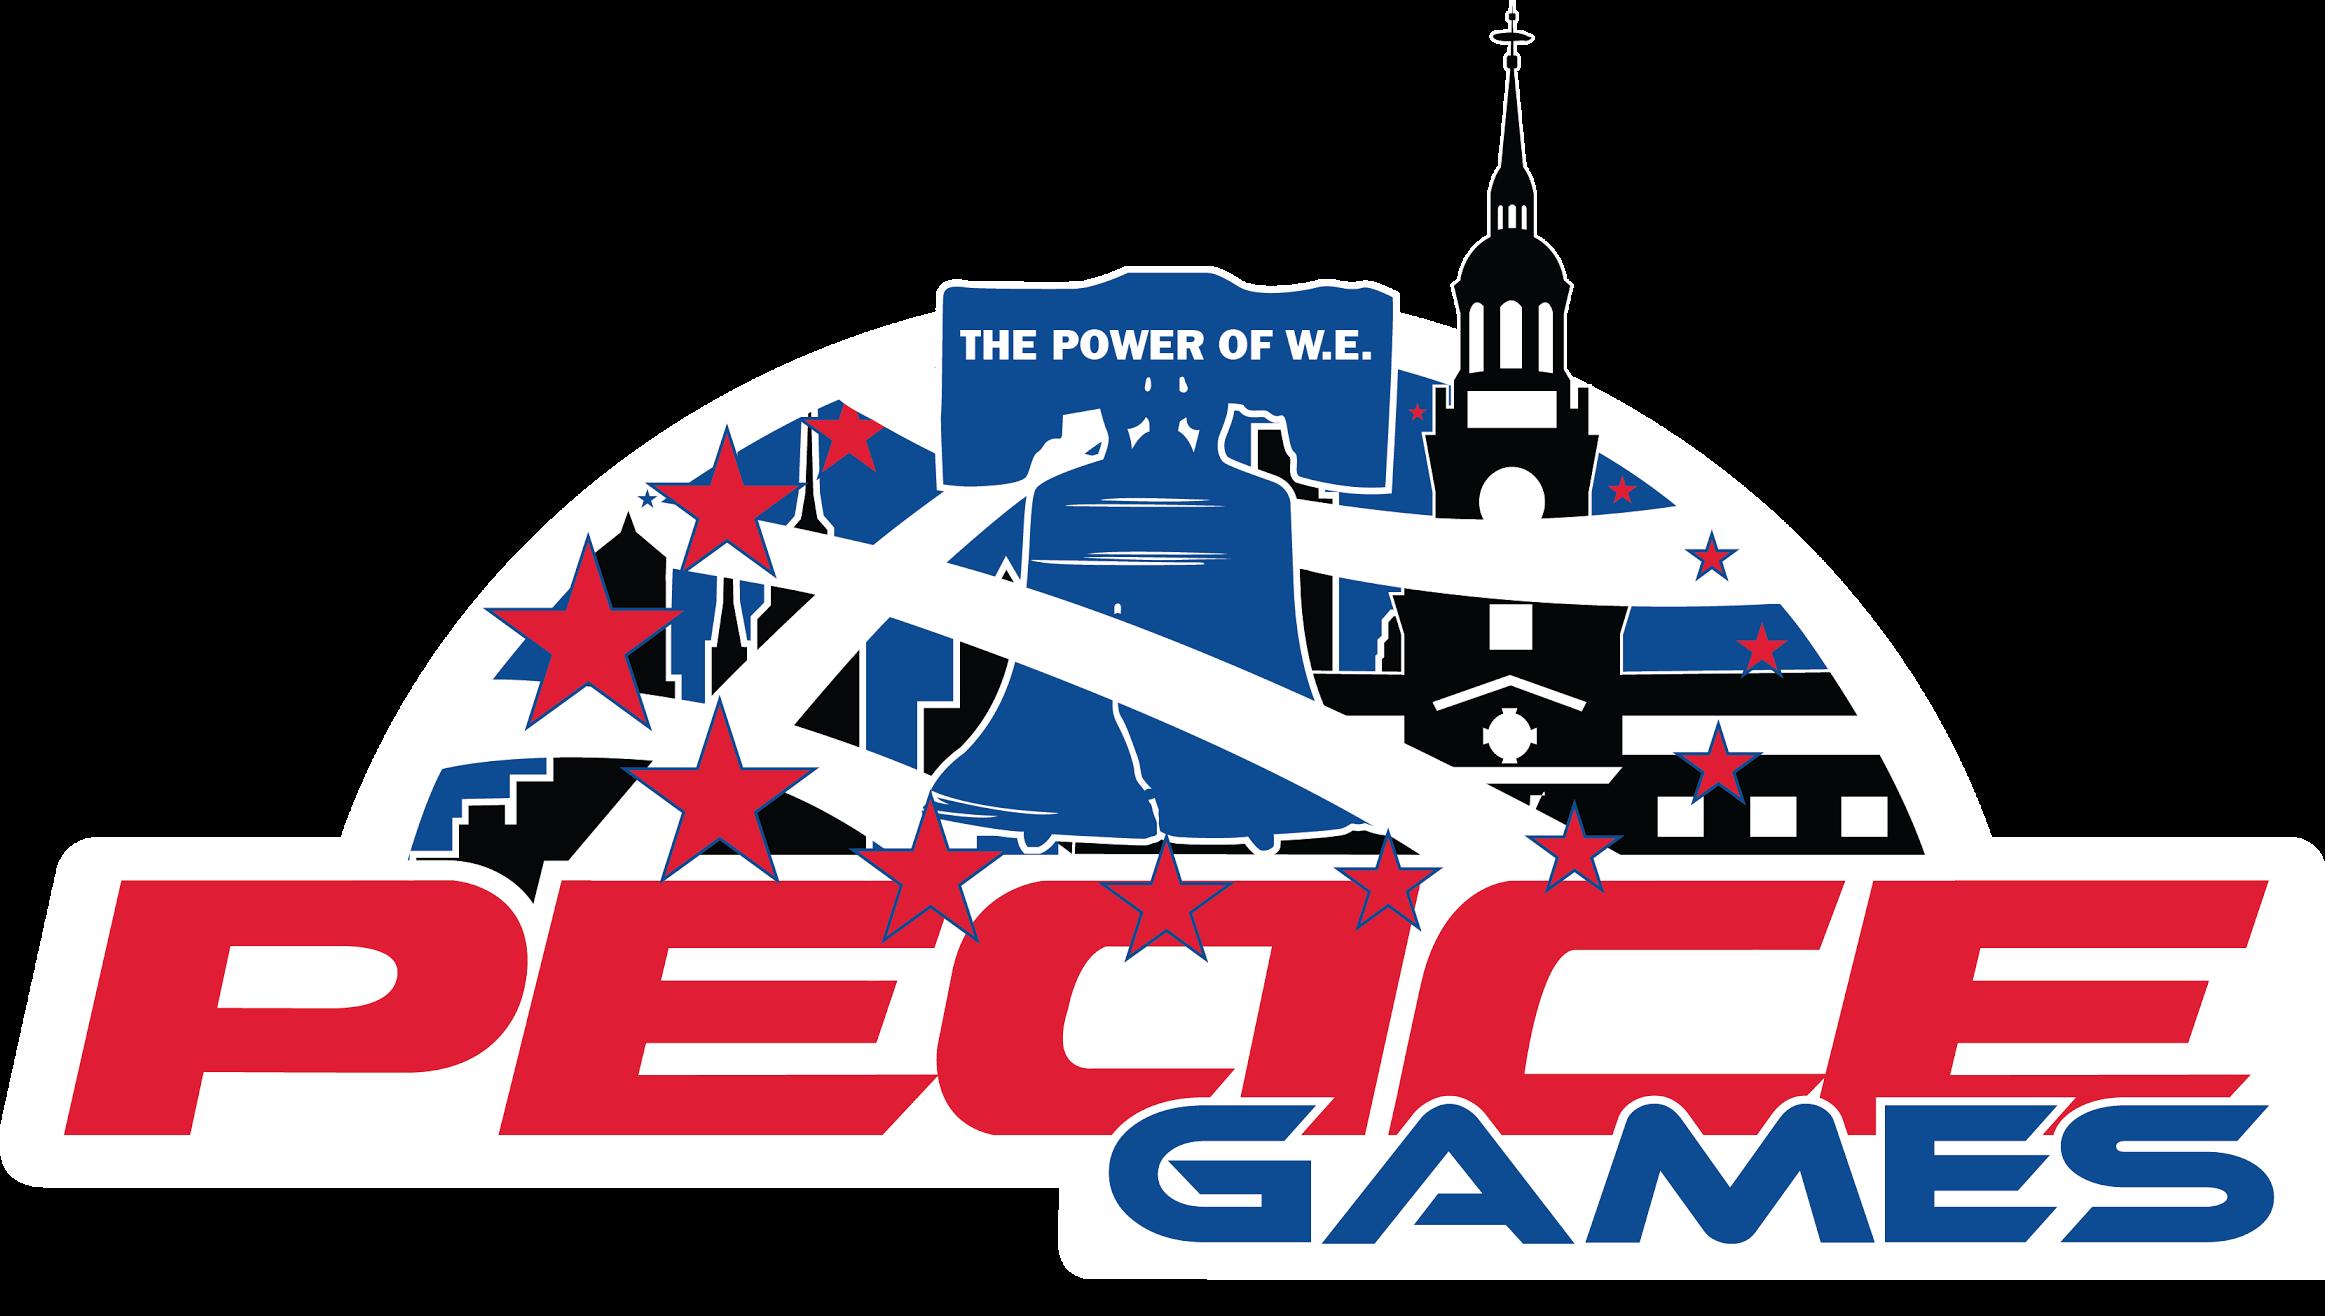 1st Annual Philadelphia Peace Games Basketball Tournament